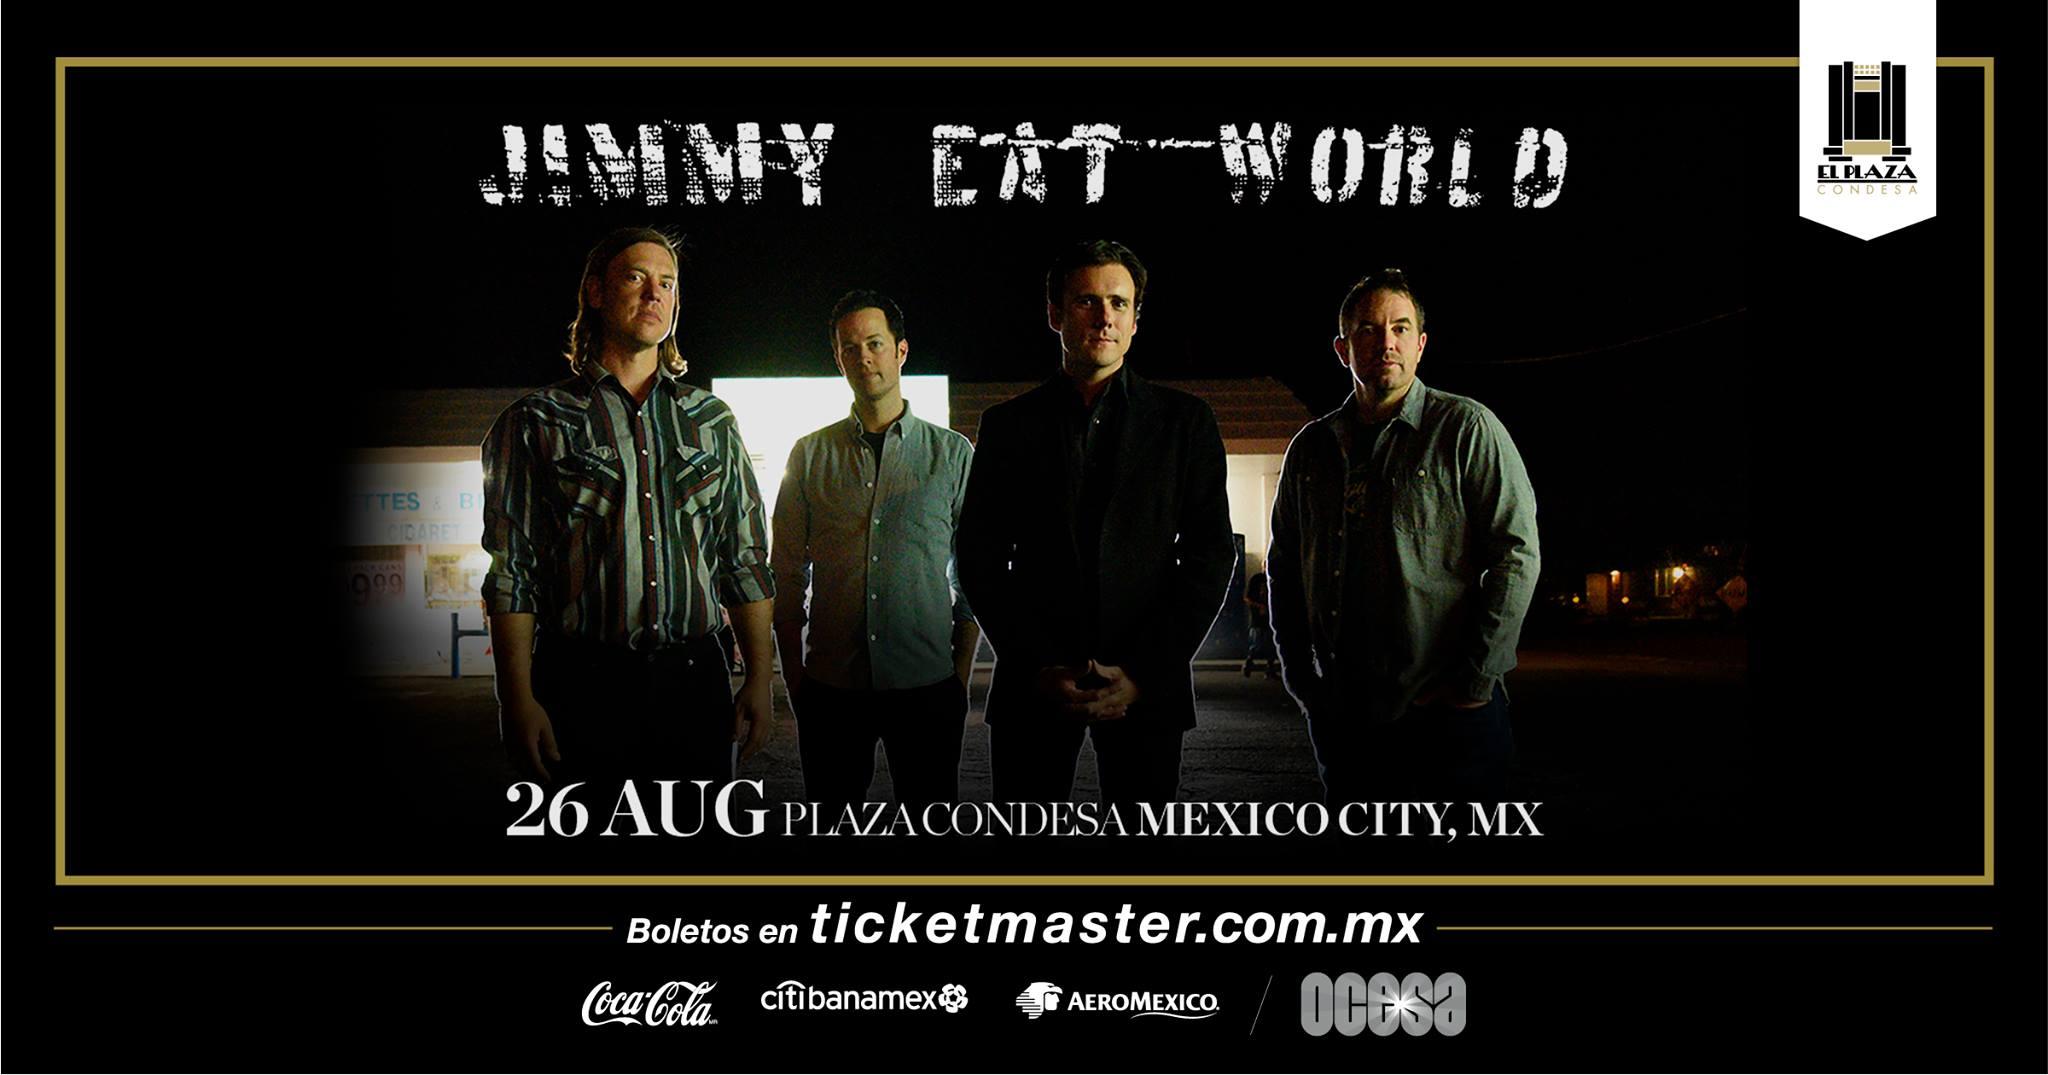 Gana un meet and greet con Jimmy Eat World en Ciudad de México